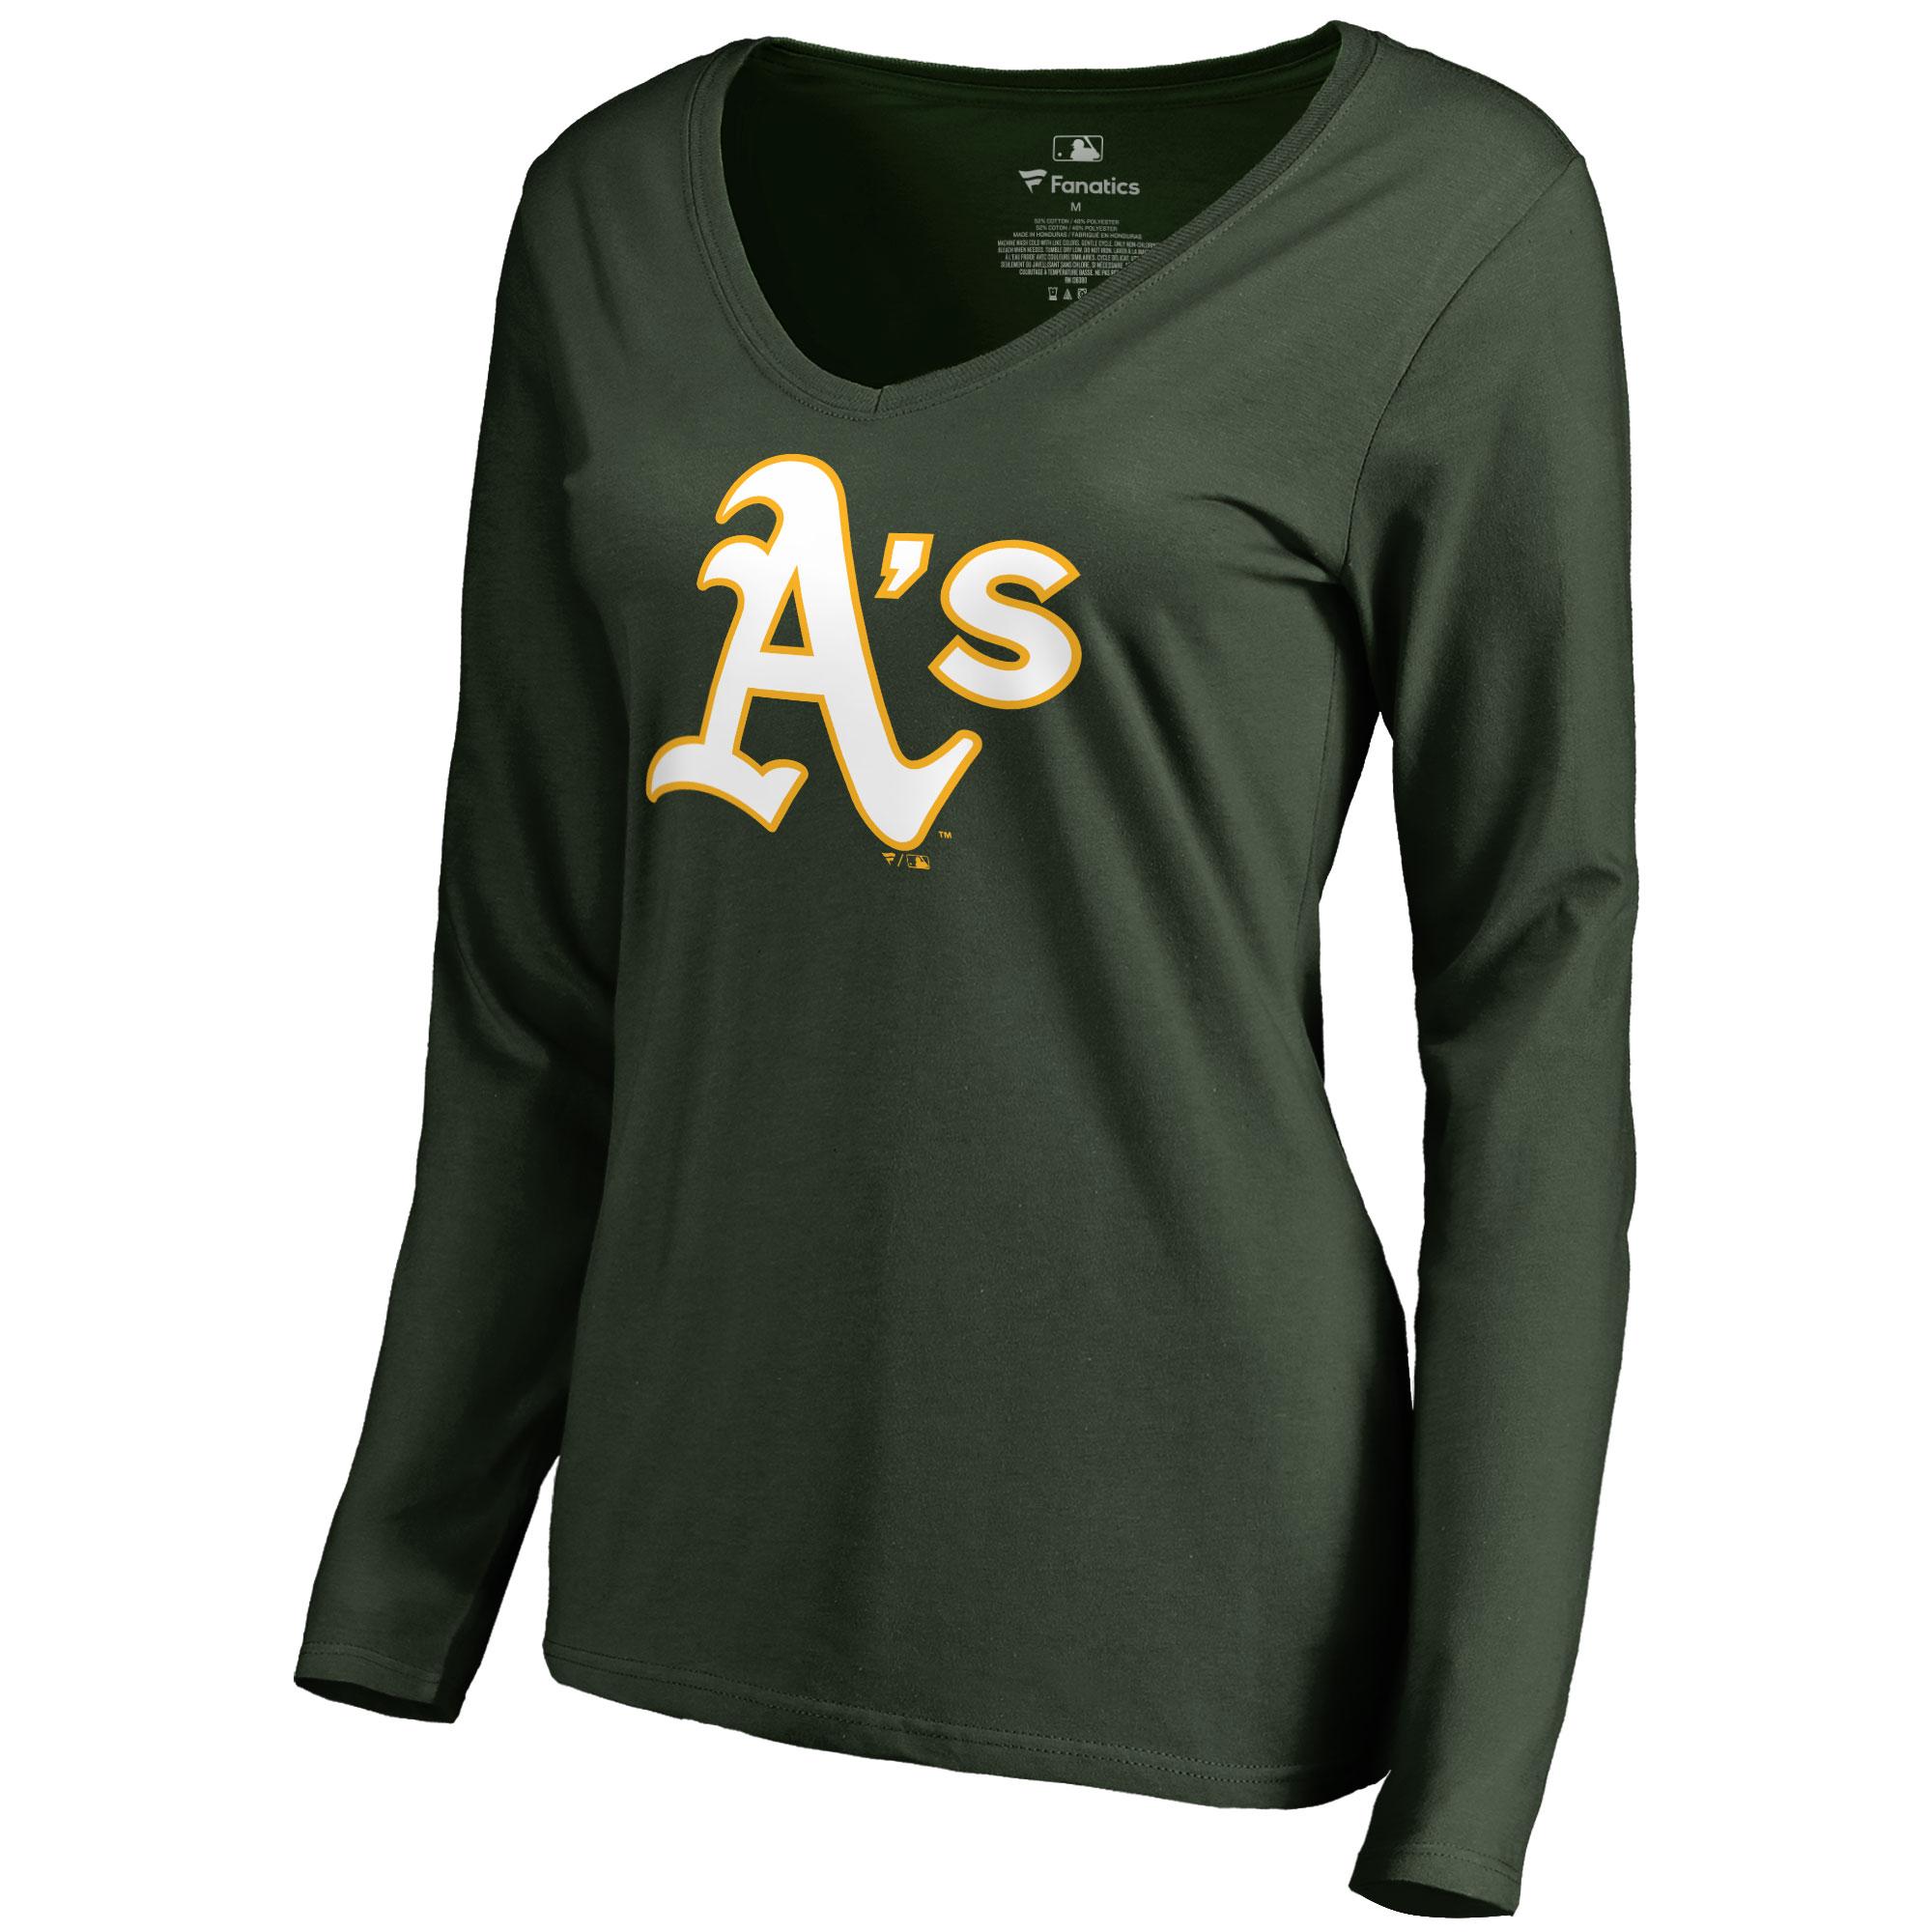 Oakland Athletics Women's Team Color Primary Logo V-Neck Long Sleeve T-Shirt - Green